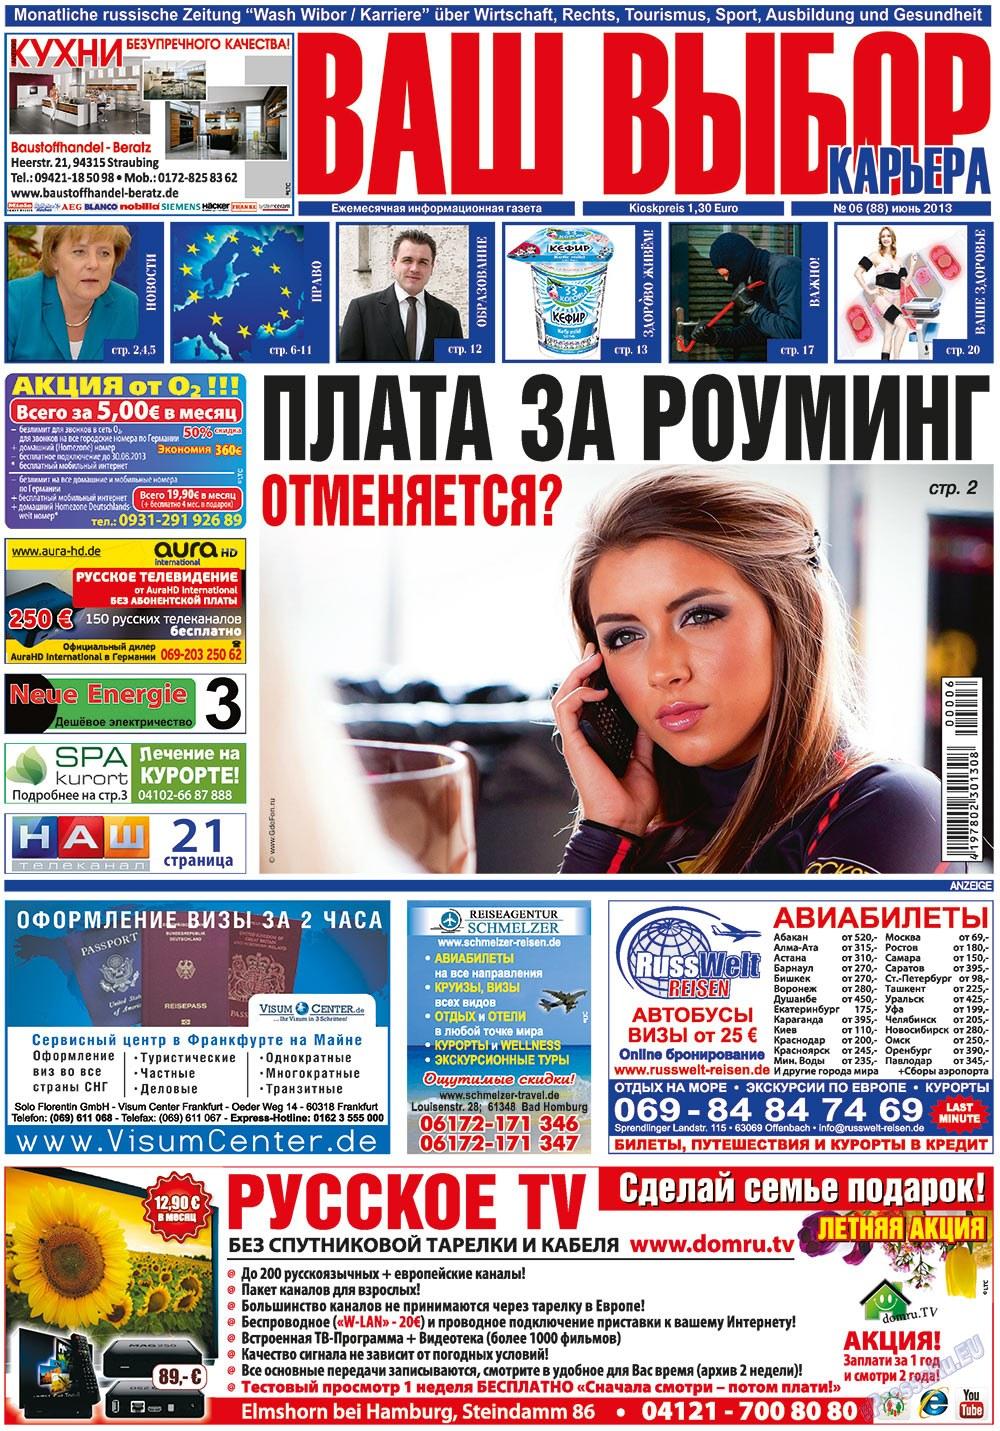 Карьера (газета). 2013 год, номер 6, стр. 1